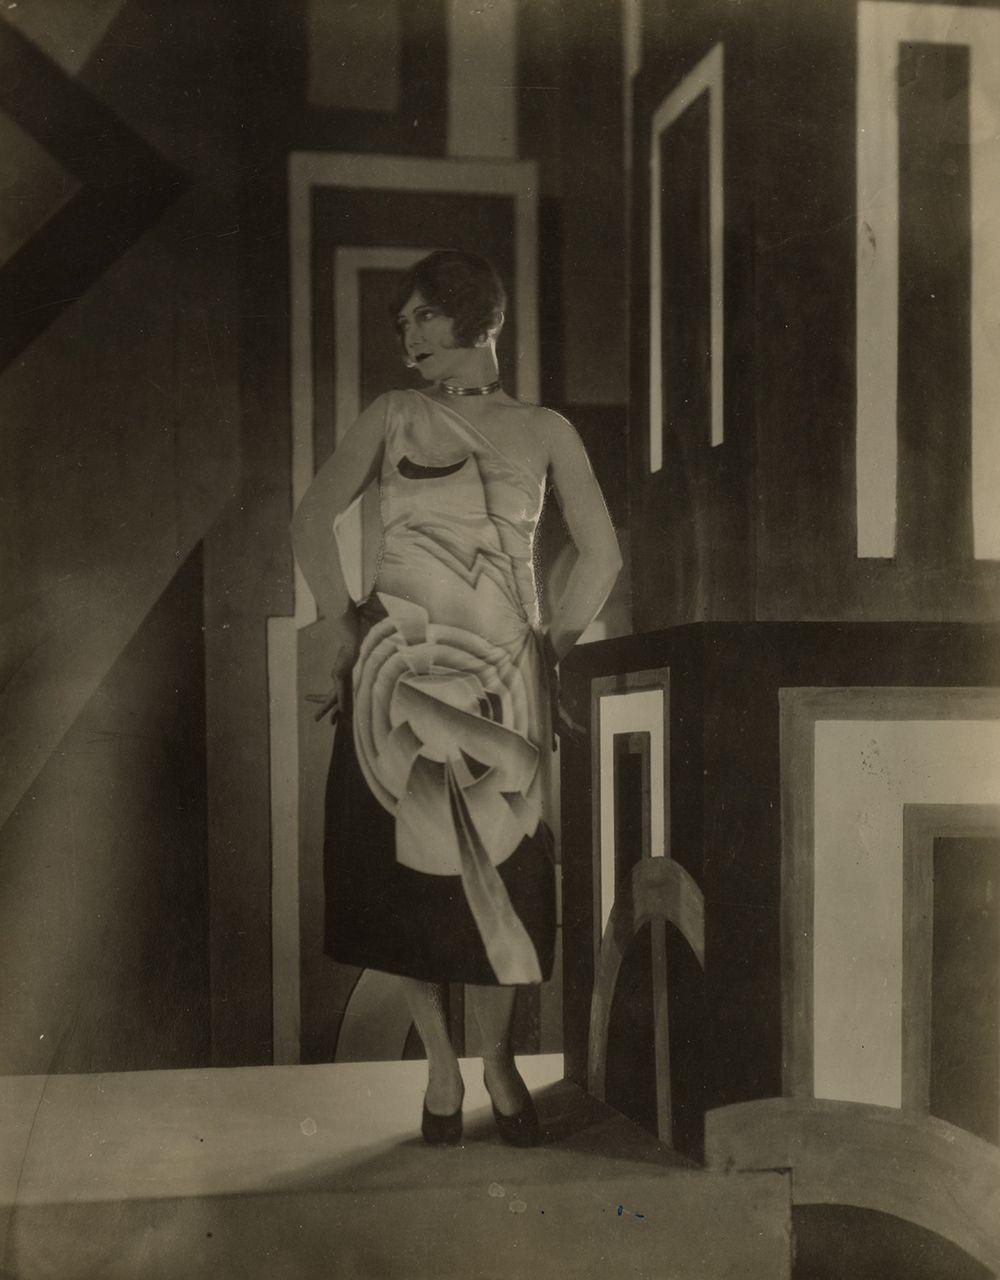 A Louis Lozowick-designed dress worn by Gilda Gray.